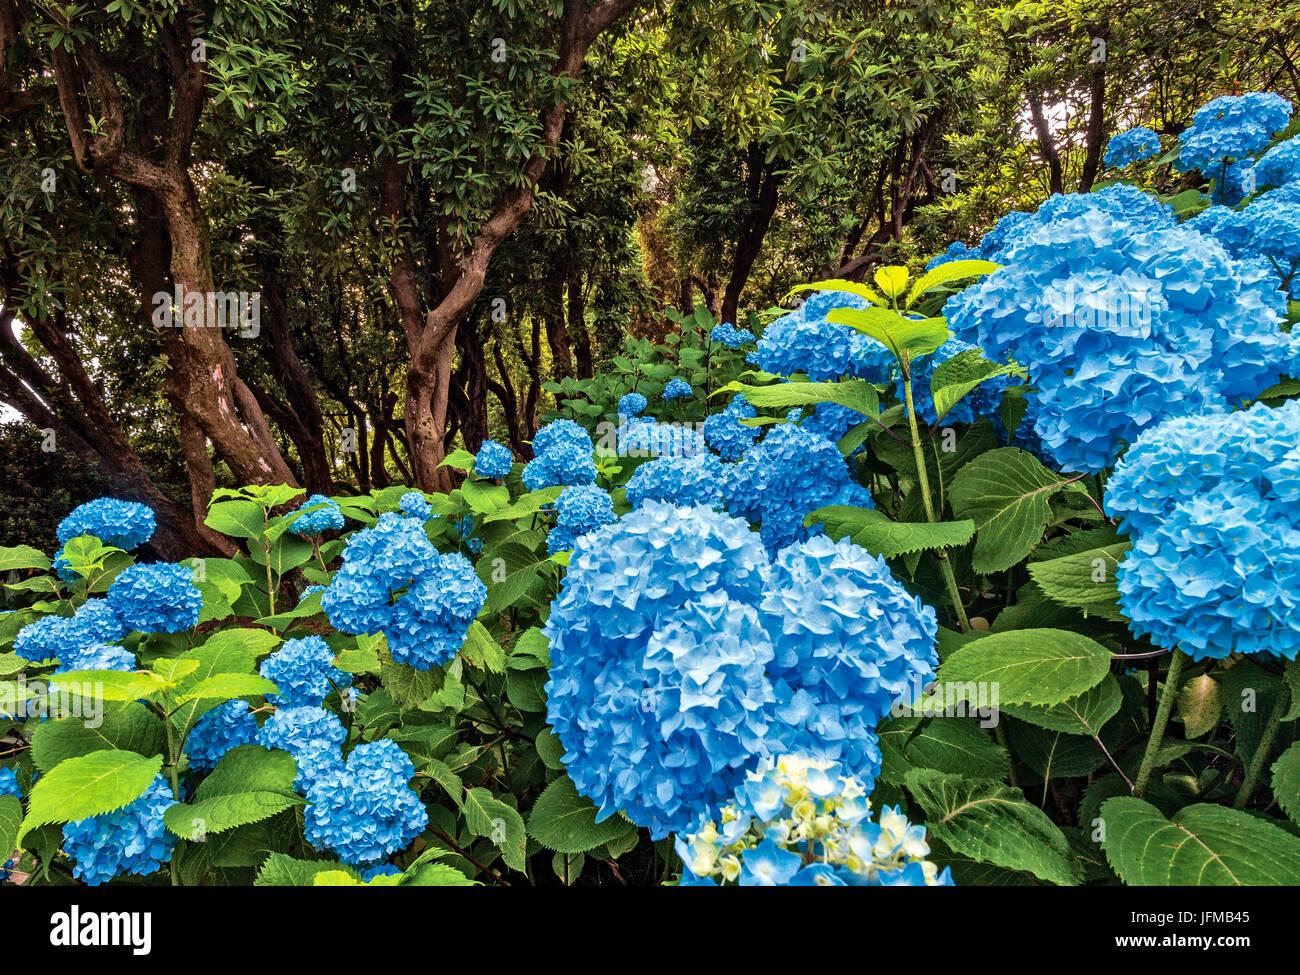 blooming, Hydrangea, rhododendron arboreum, Villa Carlotta, botanic garden, Tremezzina, Como Lake, Lombardy, Italy - Stock Image